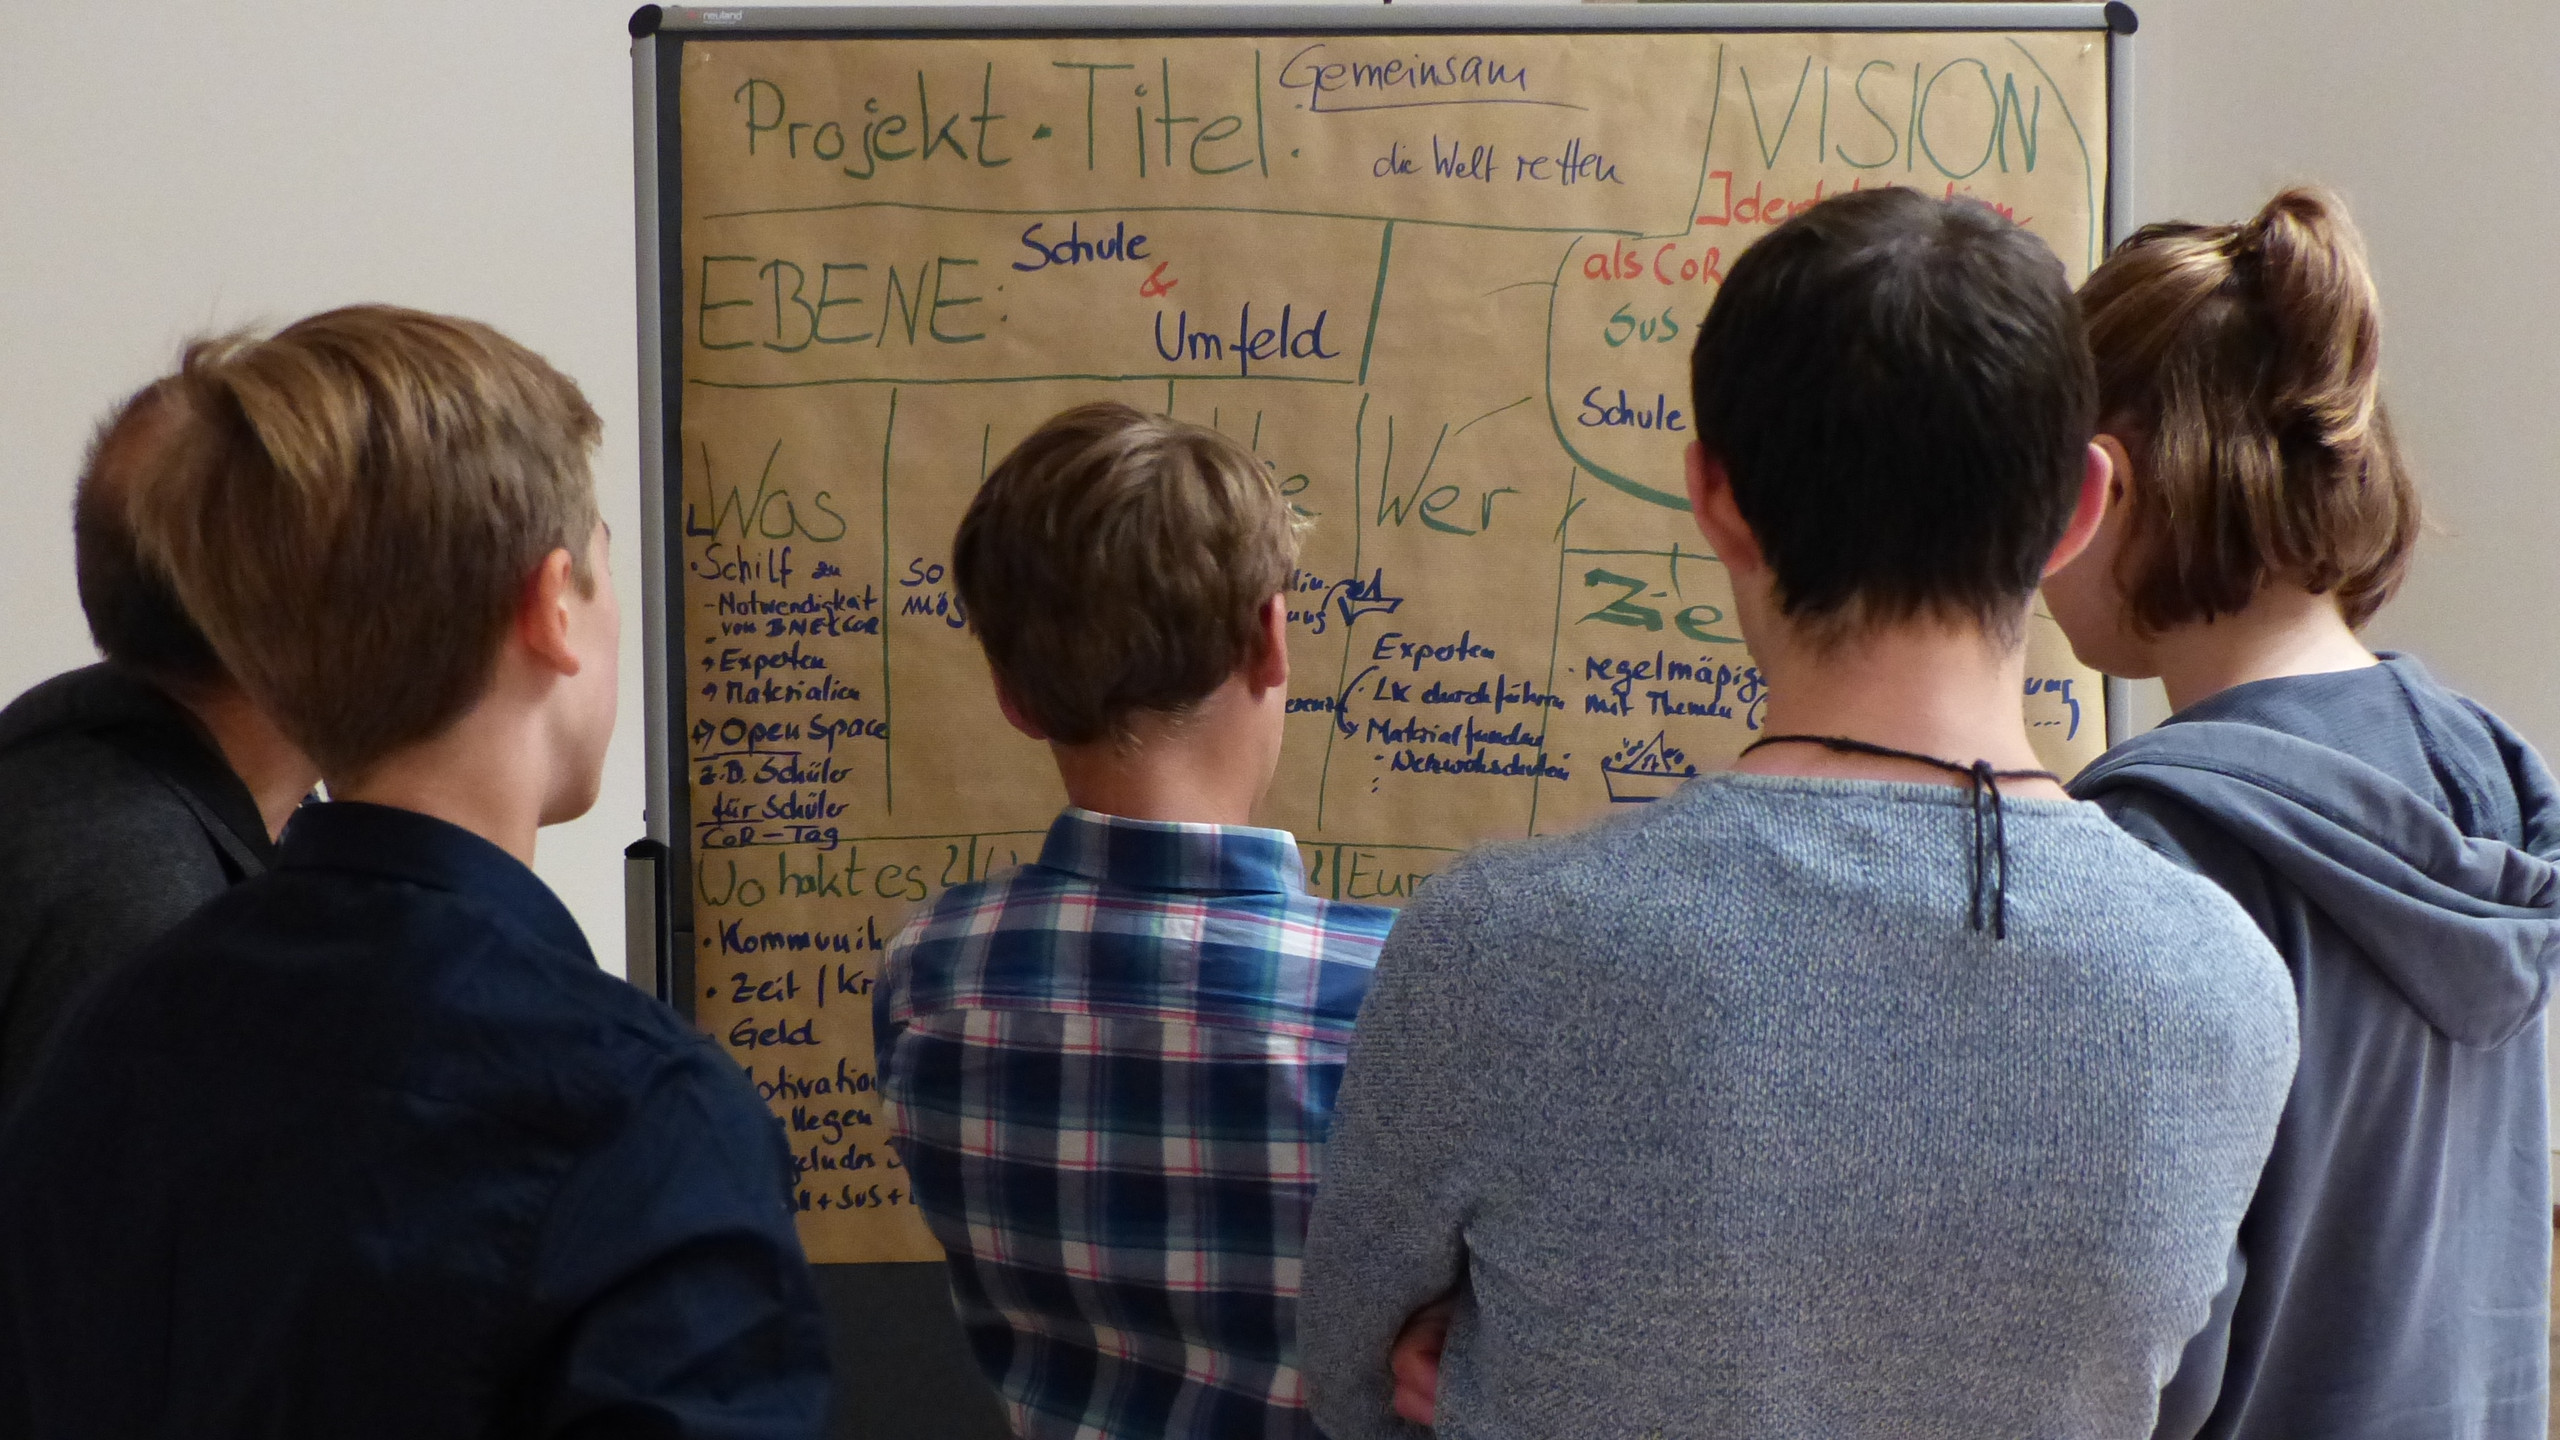 Ideenwerkstatt Berlin